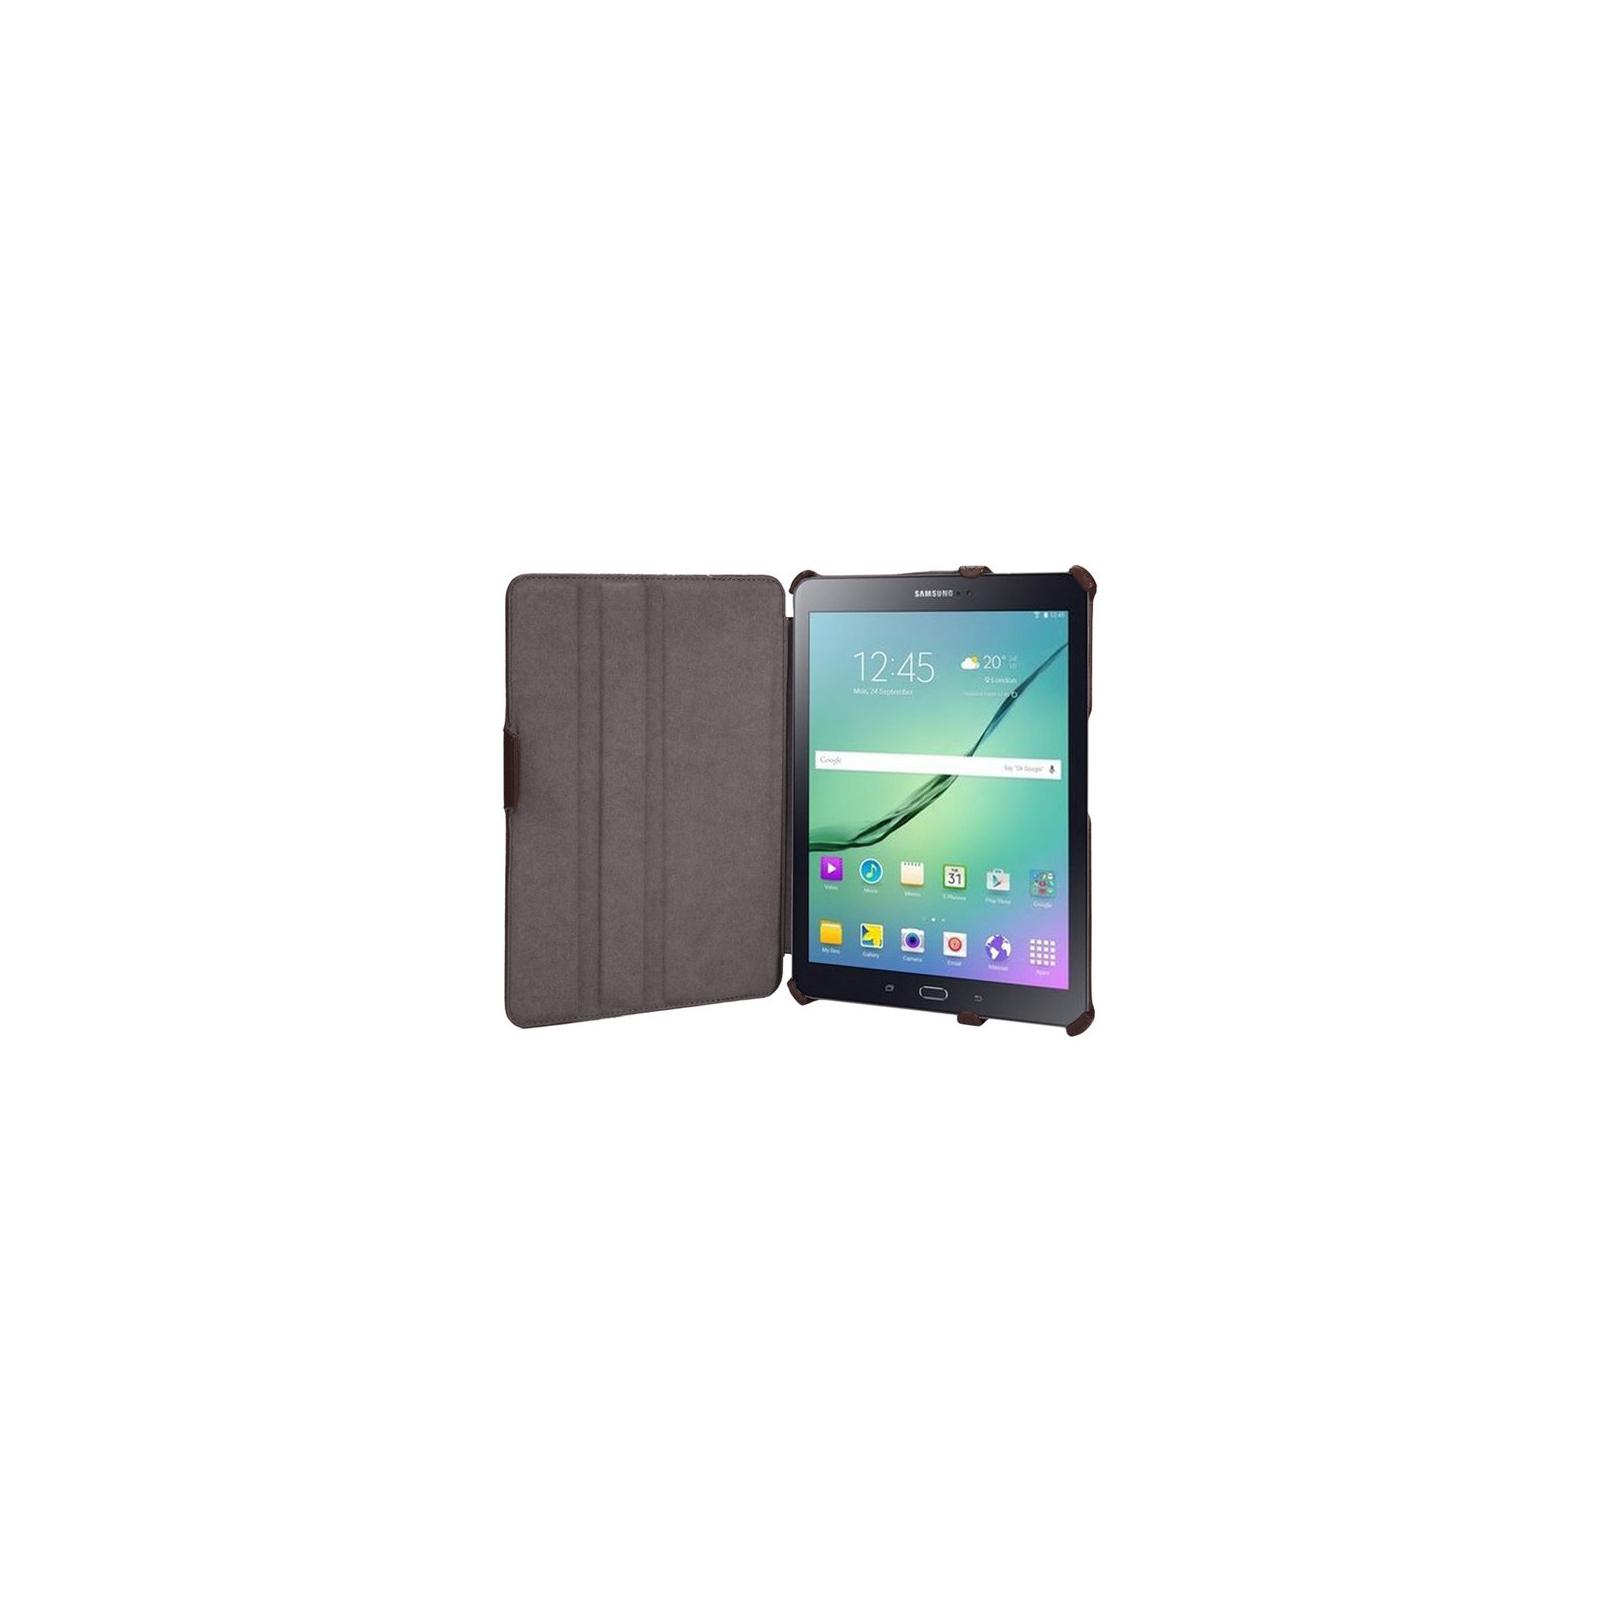 Чехол для планшета AirOn для Samsung Galaxy Tab S 2 8.0 brown (4822352778521) изображение 8